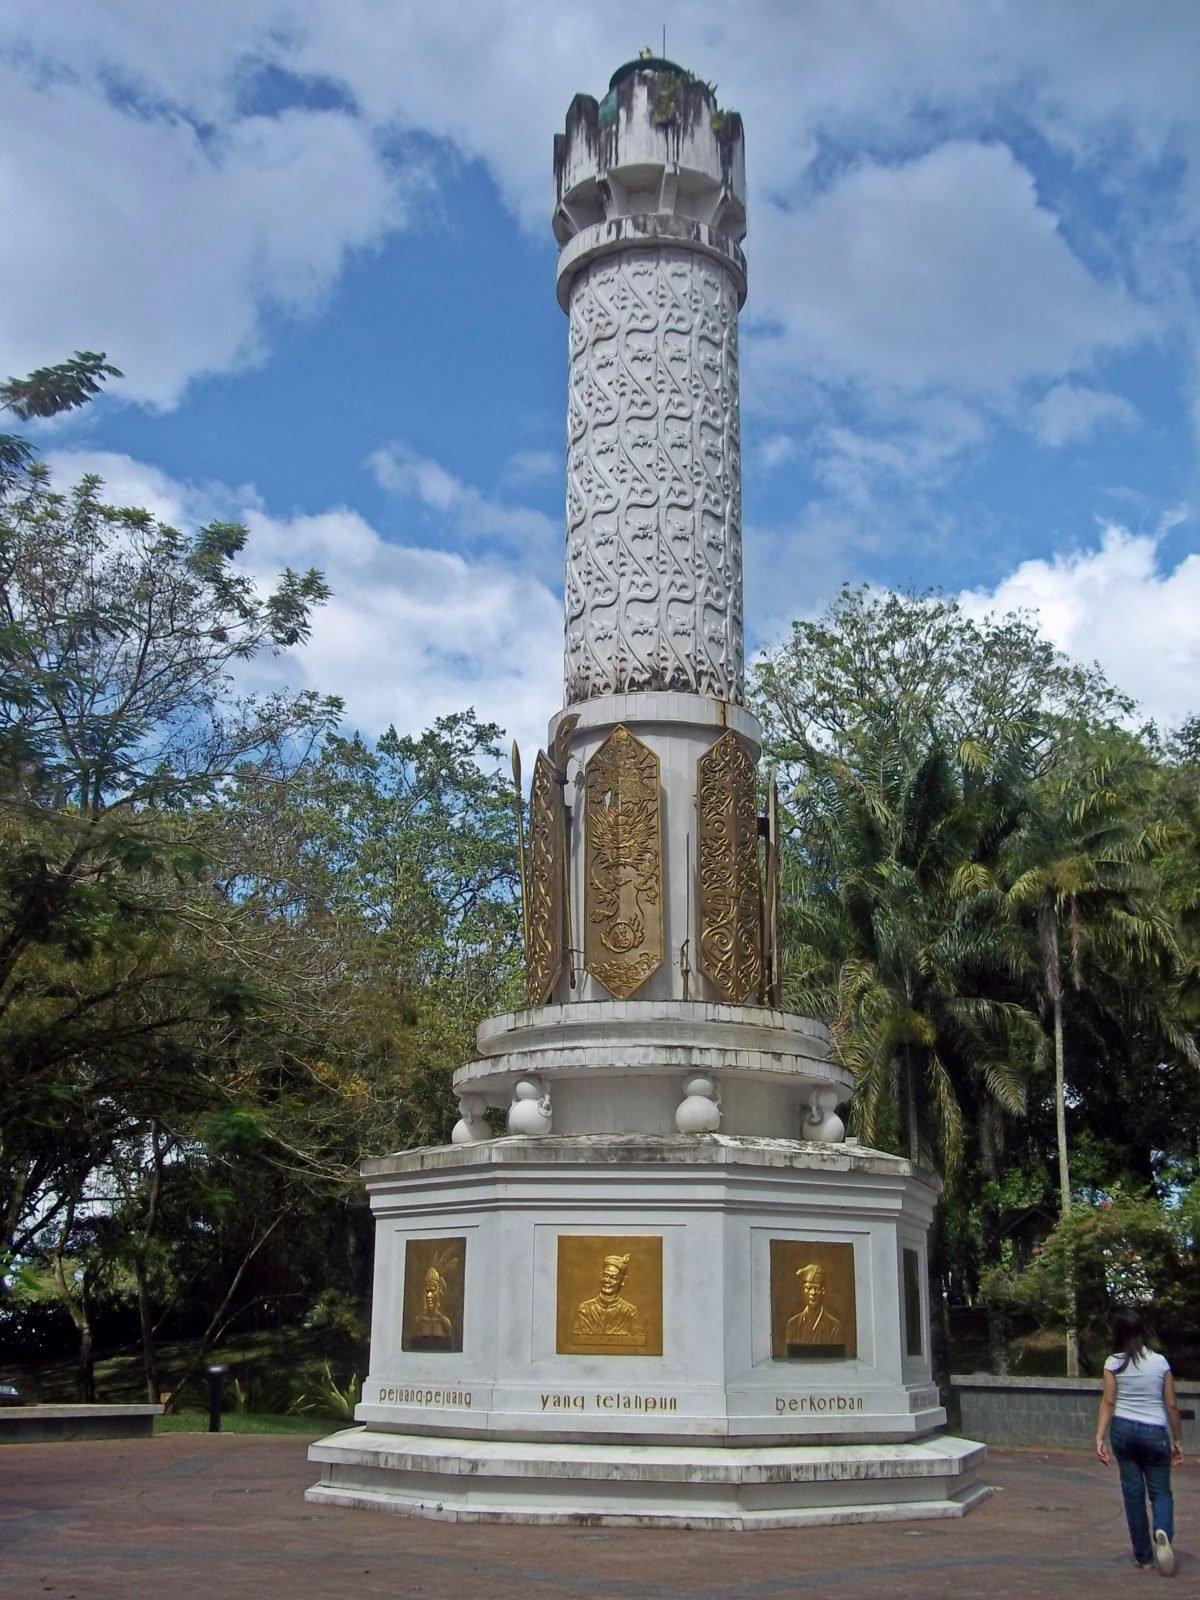 Tugu Pahlawan (Warrior Monument)